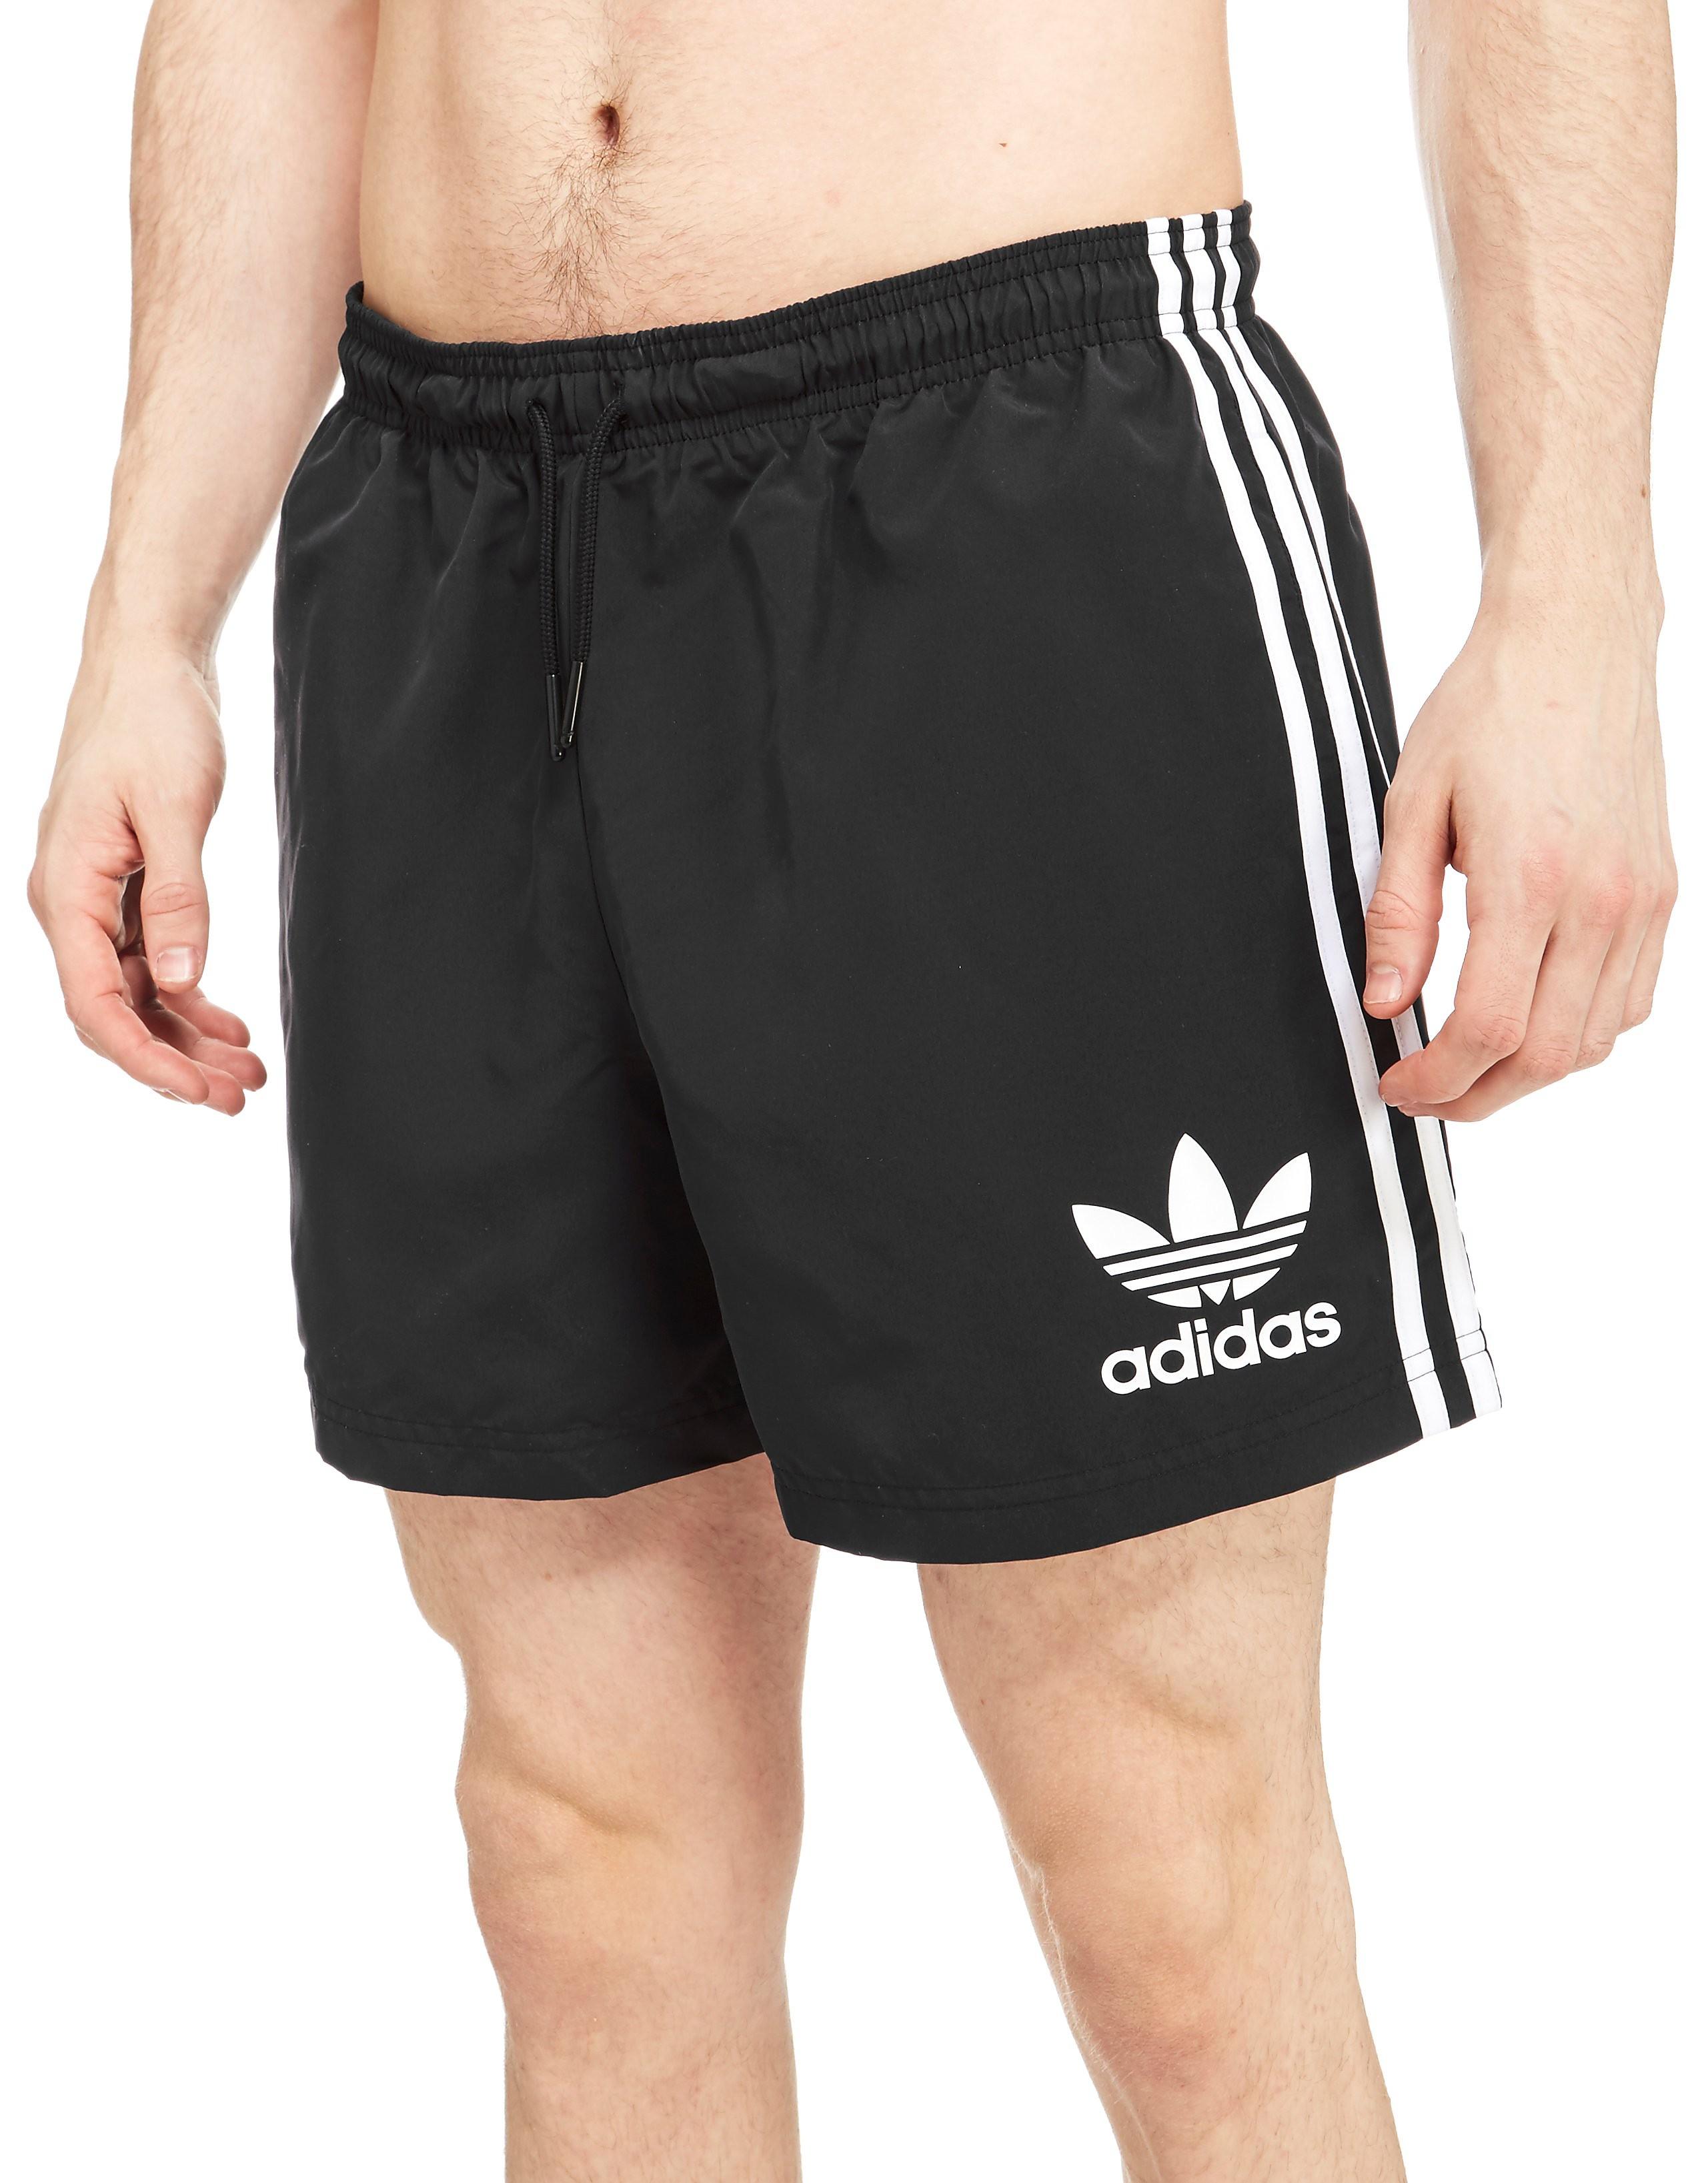 adidas Originals Cali Swimshorts